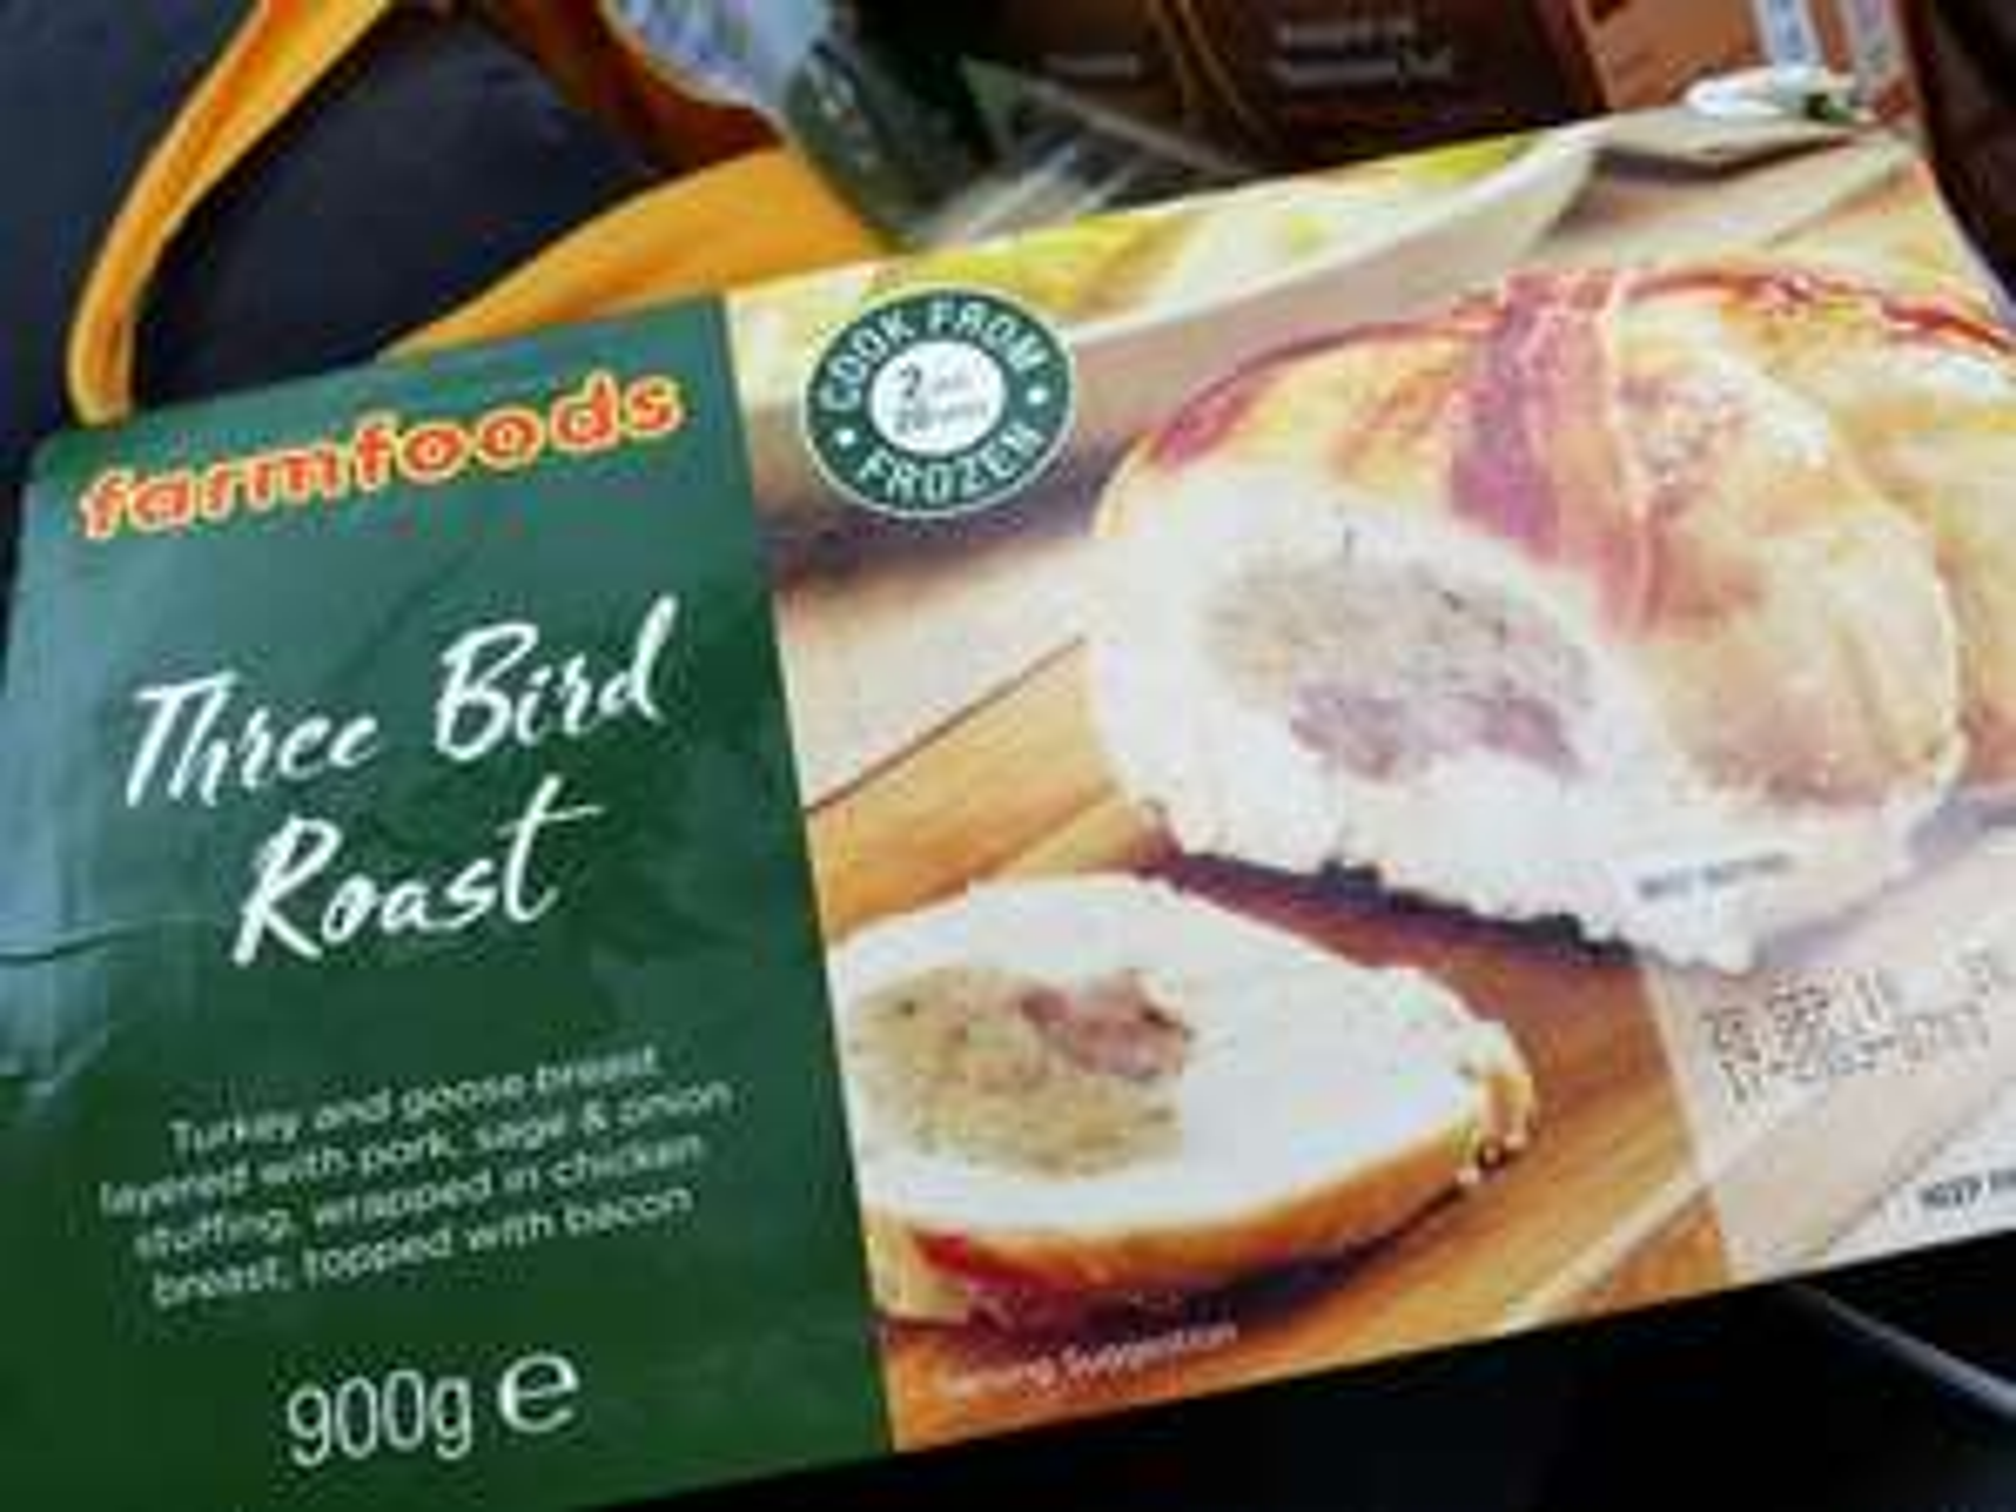 Farm foods three bird roast £1.99